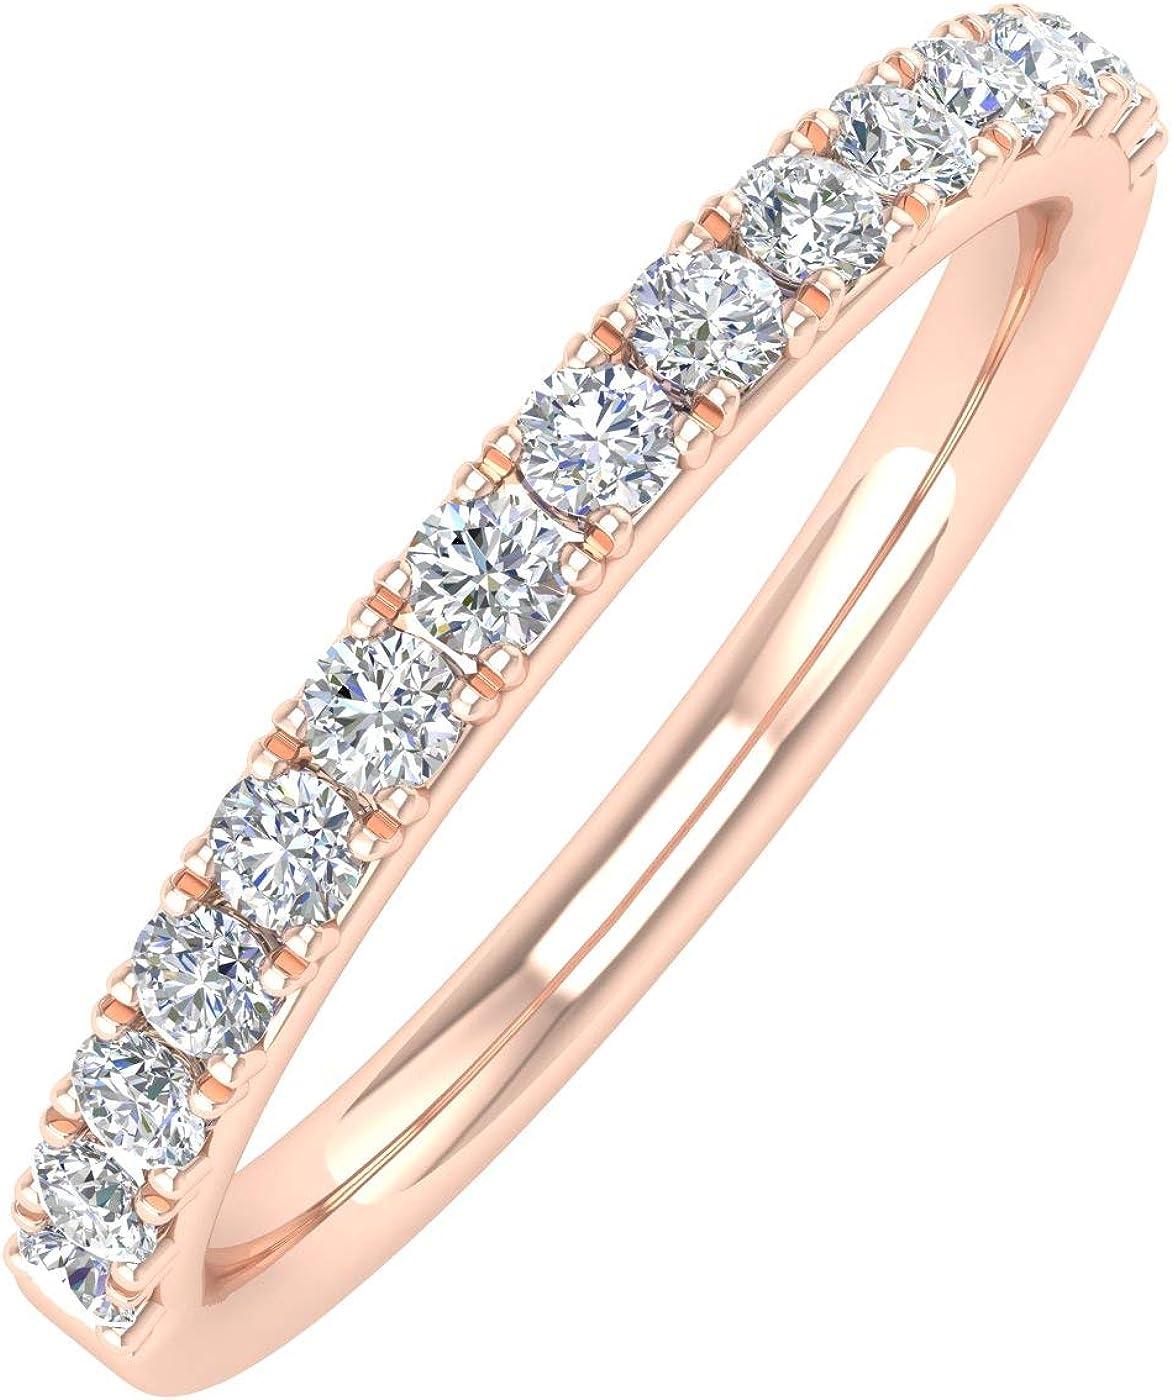 1//3 Carat Diamond Semi-Eternity Wedding Band Ring in 10K Gold